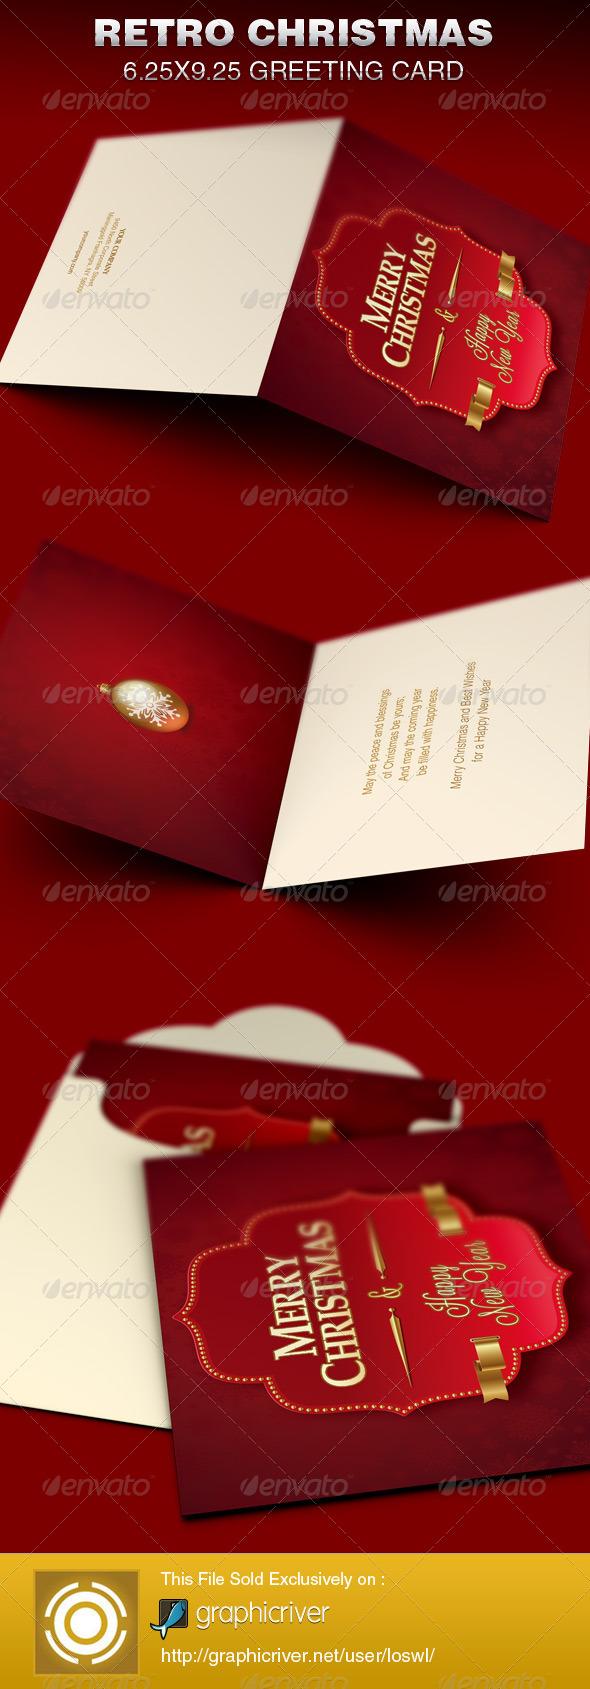 GraphicRiver Retro Christmas Greeting Card Template 6369632